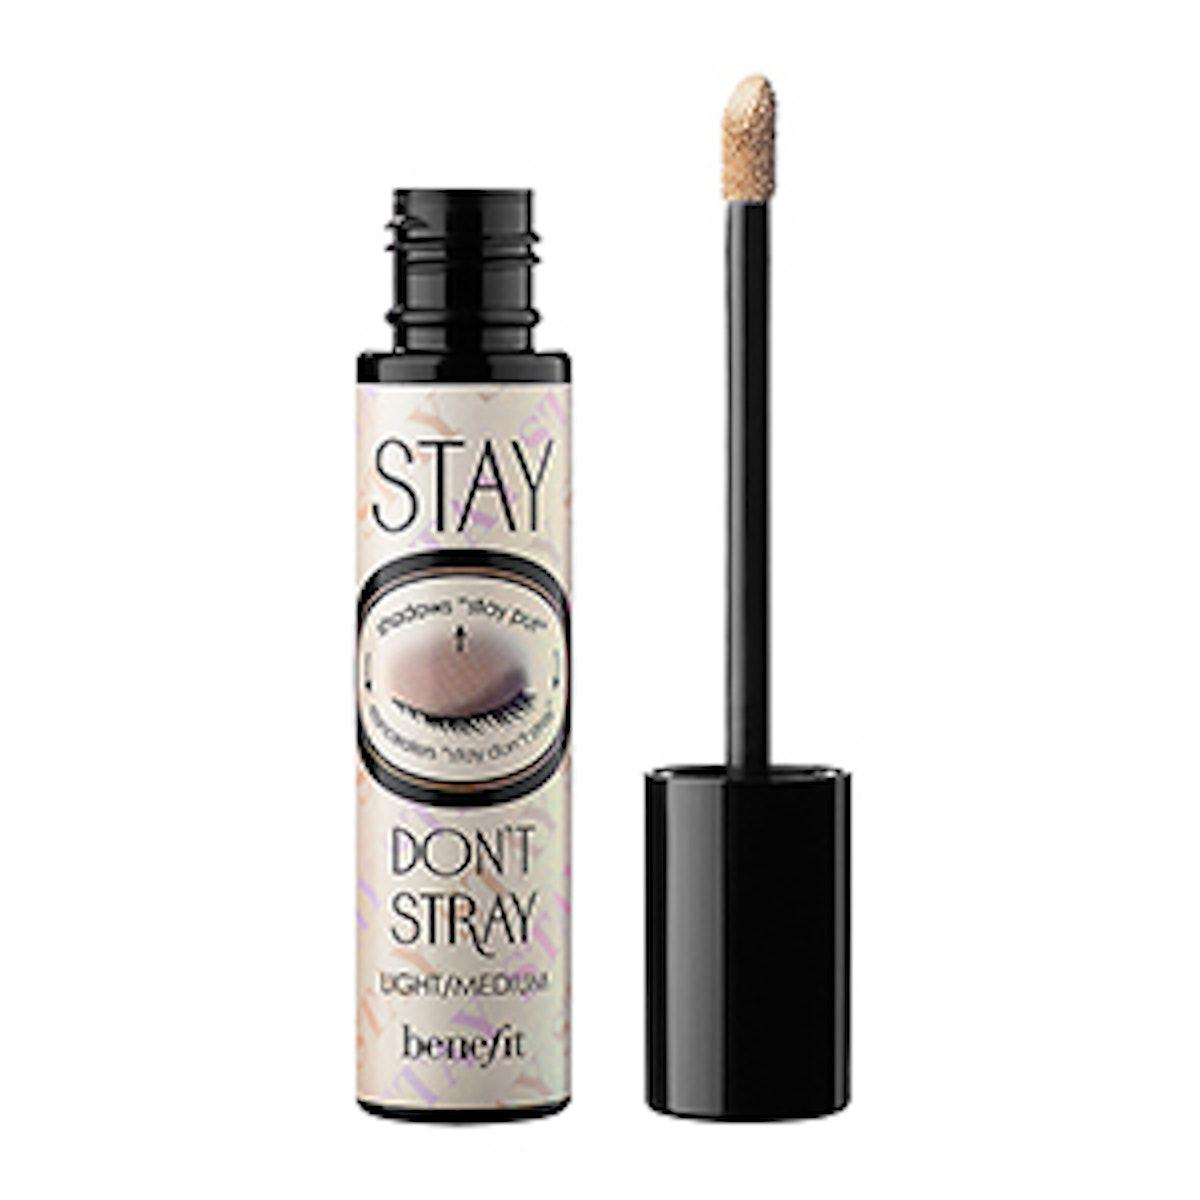 Stay Don't Stray 360 Degree Stay Put Eyeshadow Primer